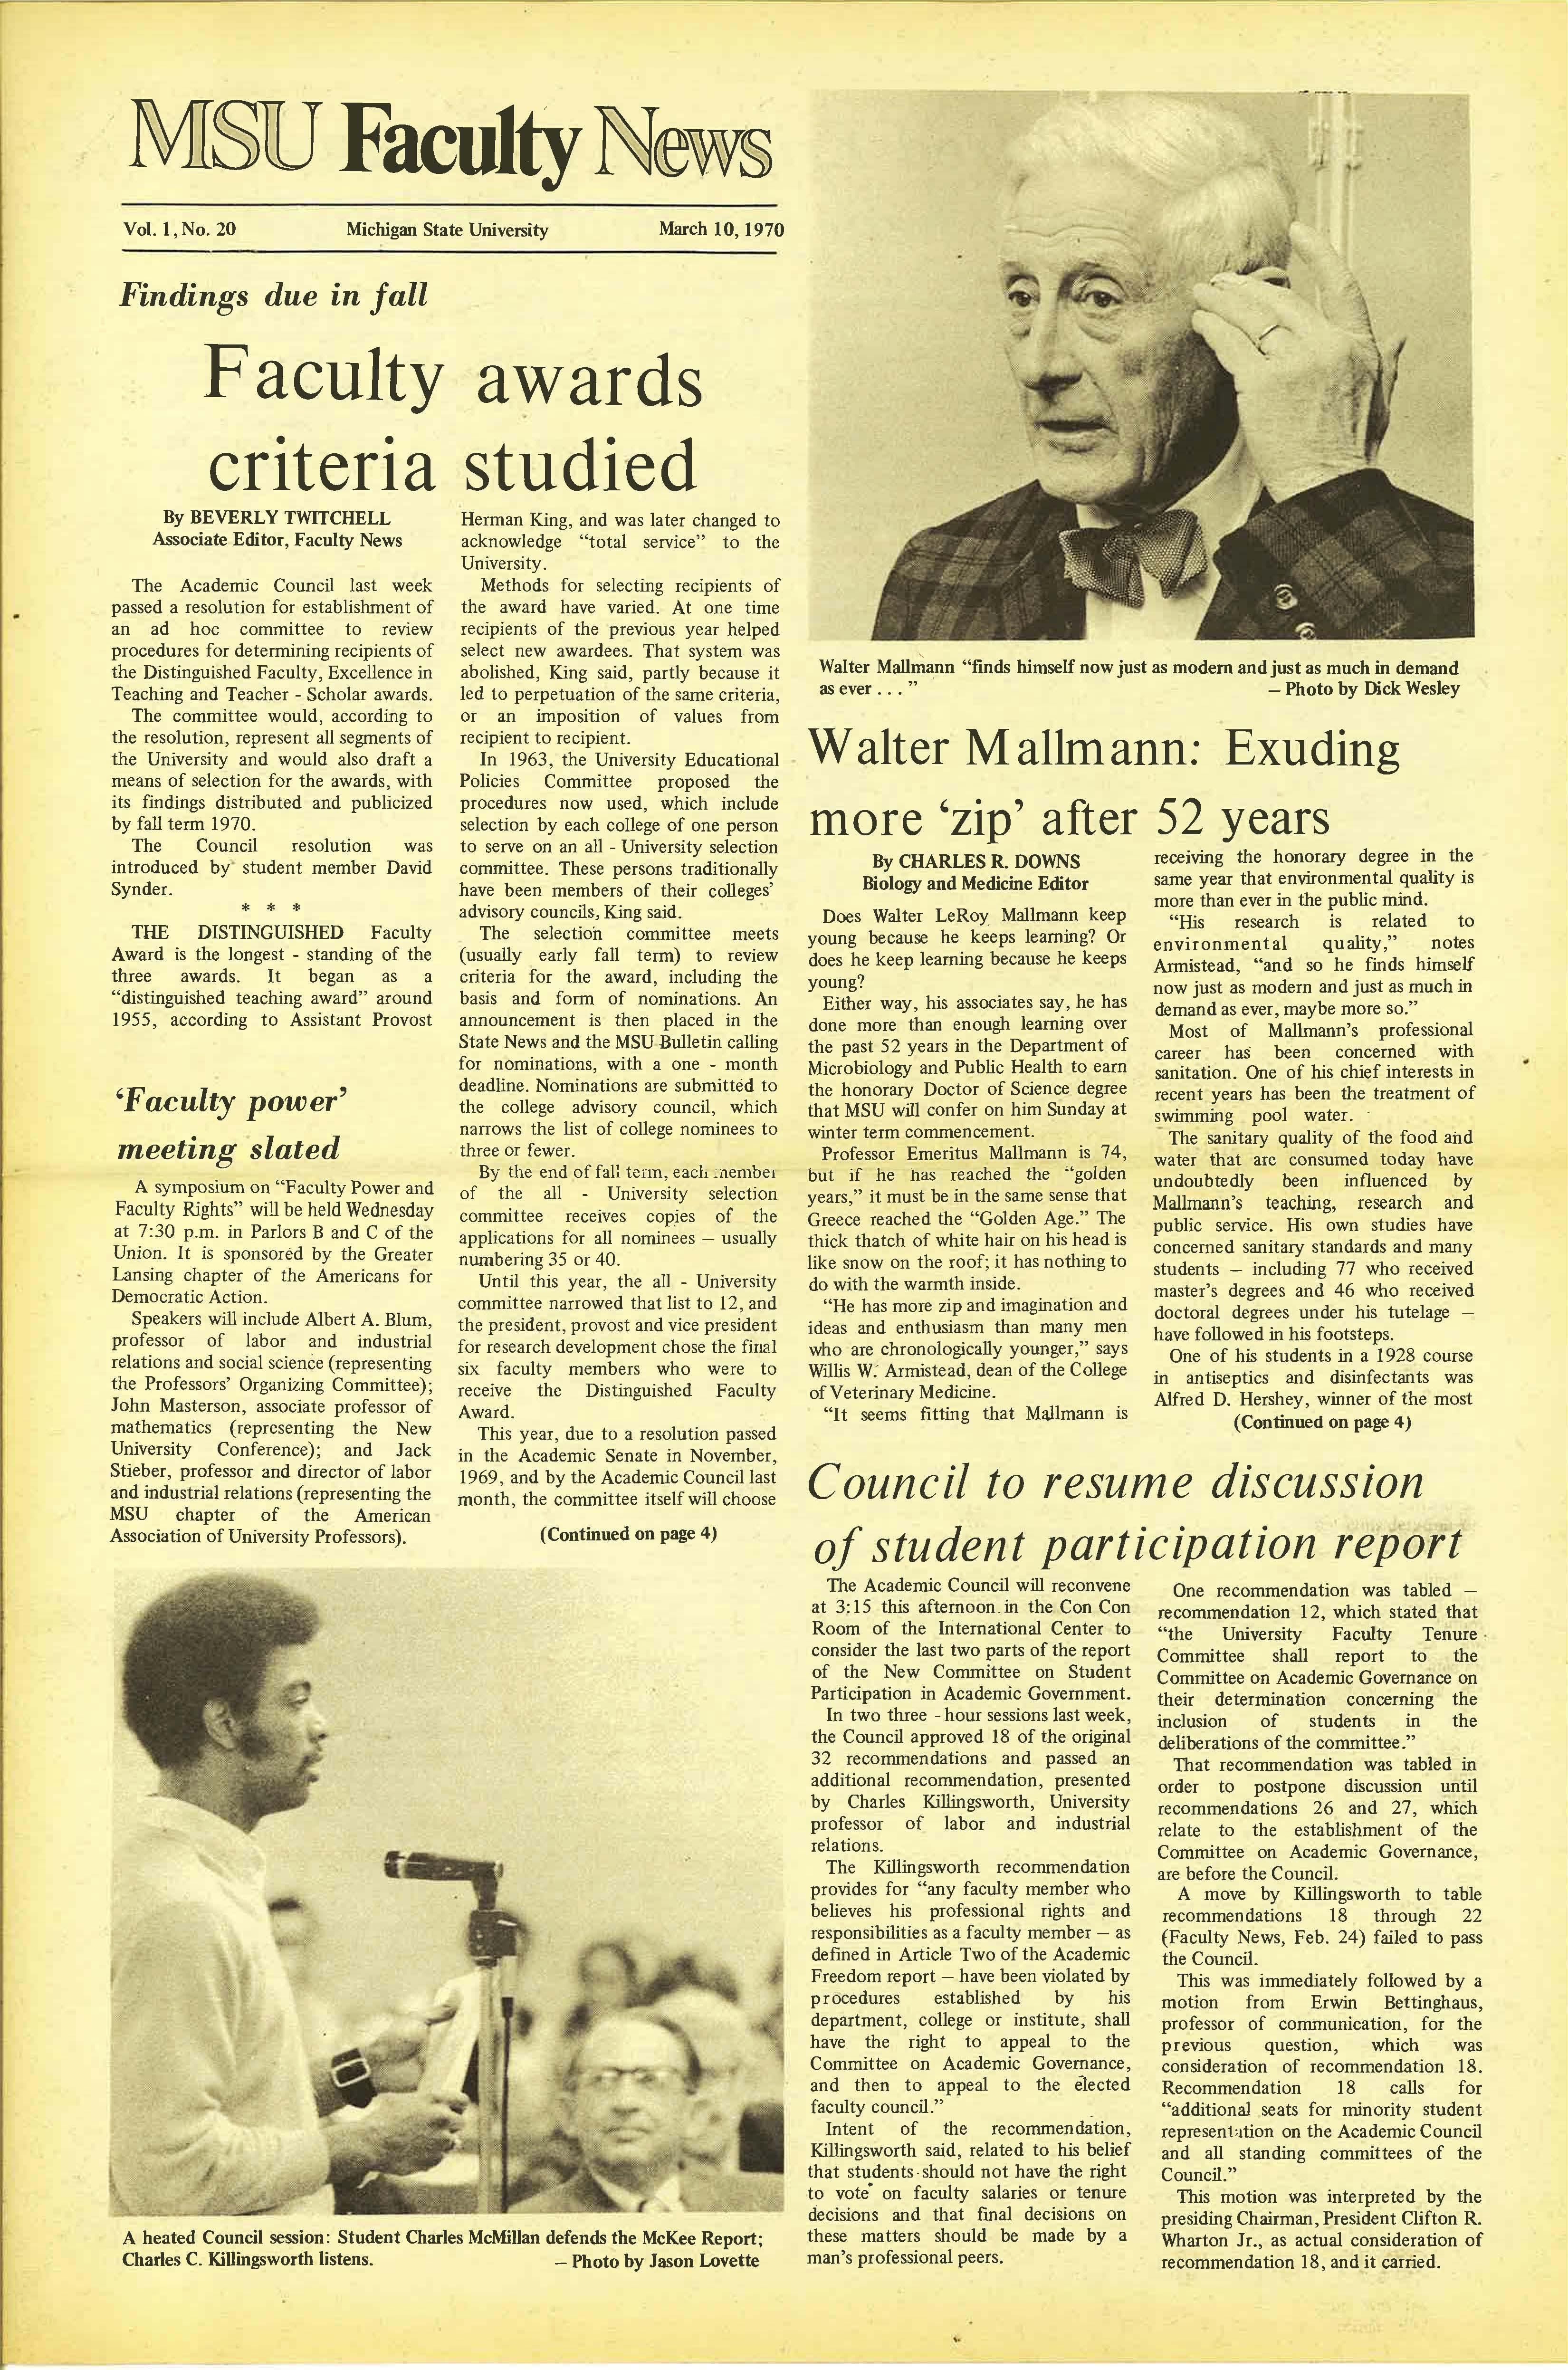 MSU News Bulletin, Vol. 2, No. 10, December 1, 1970